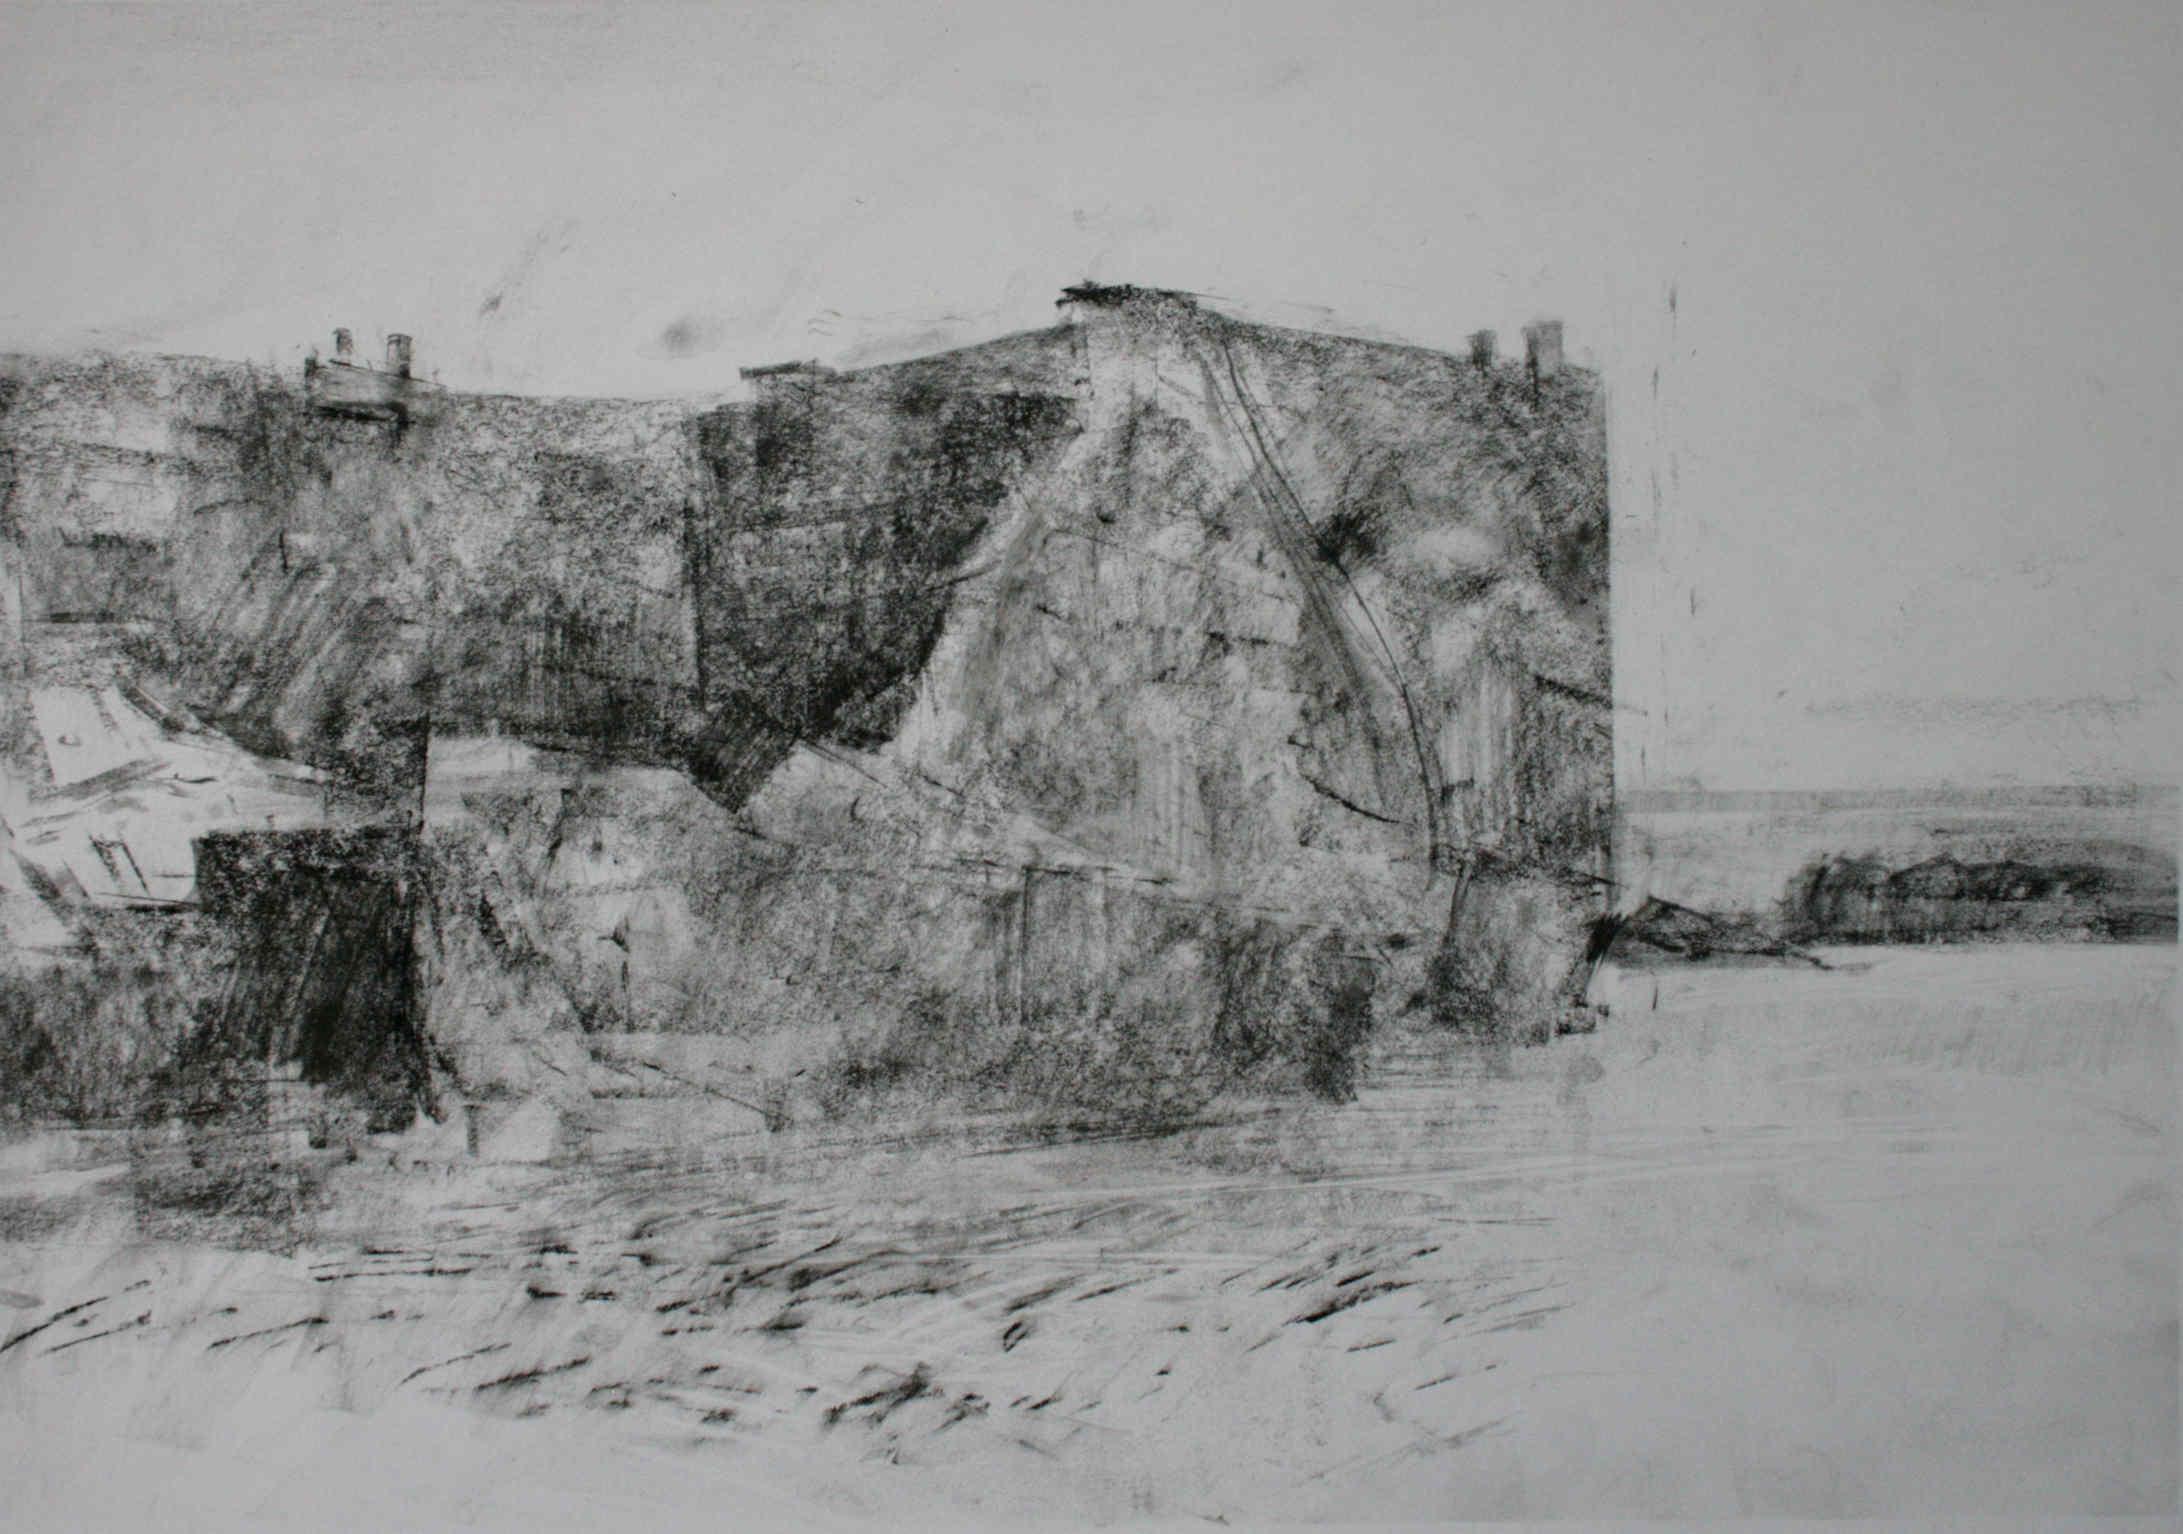 10.05am, 13 July 2013. Remnants of Mulberry Harbour, eastern end. Arromanches (Asnelles) Low Tide.